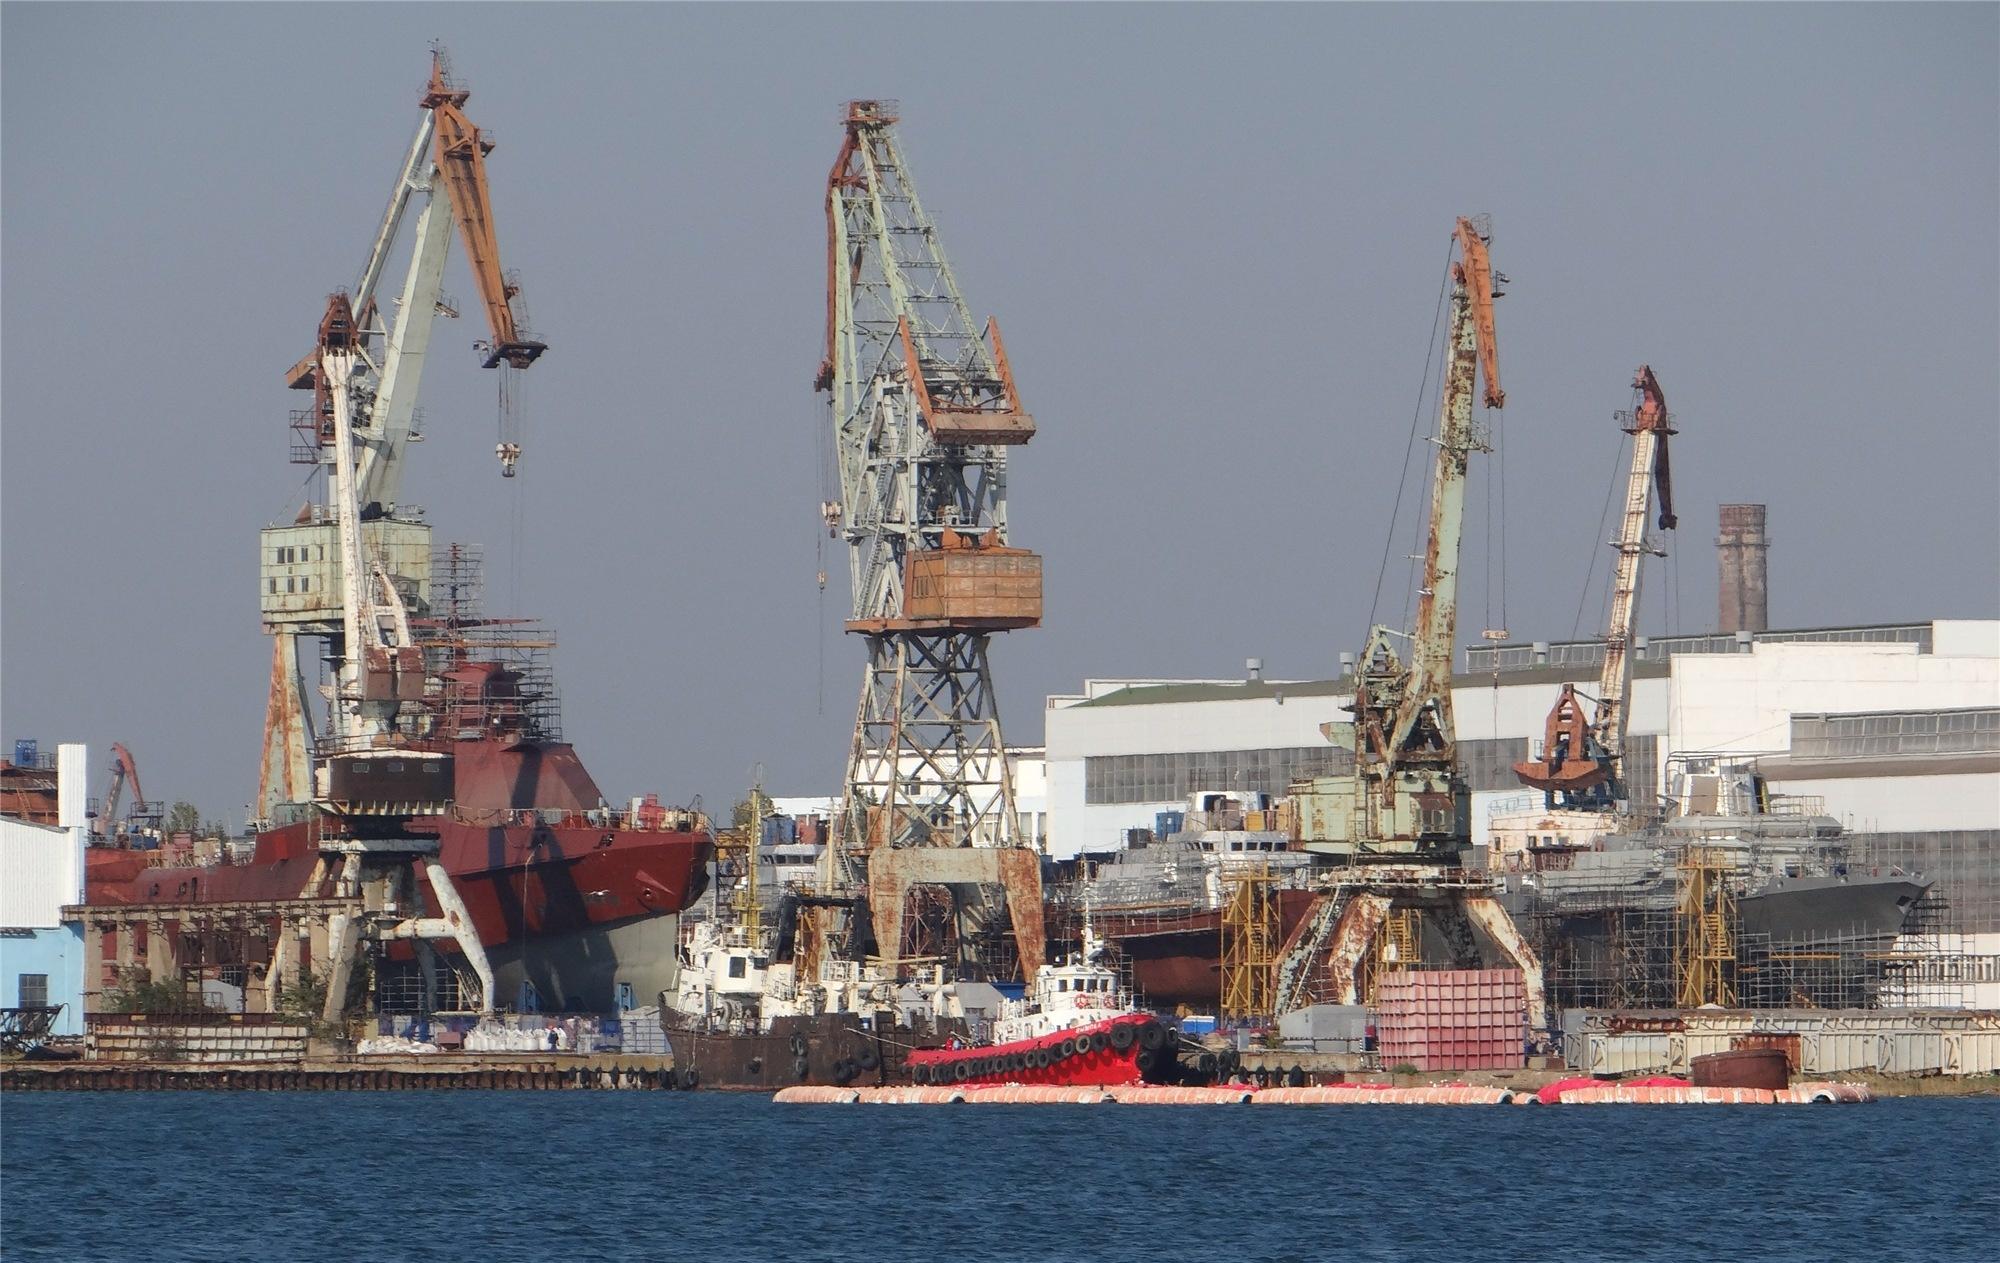 "Project 22800: ""Karakurt"" class missile ship - Page 23 F_Yi5yYWRpa2FsLnJ1L2IwMC8xODEwLzVlLzkyMzE0N2E2ZWM0Yy5qcGc_X19pZD0xMTI3MTE="